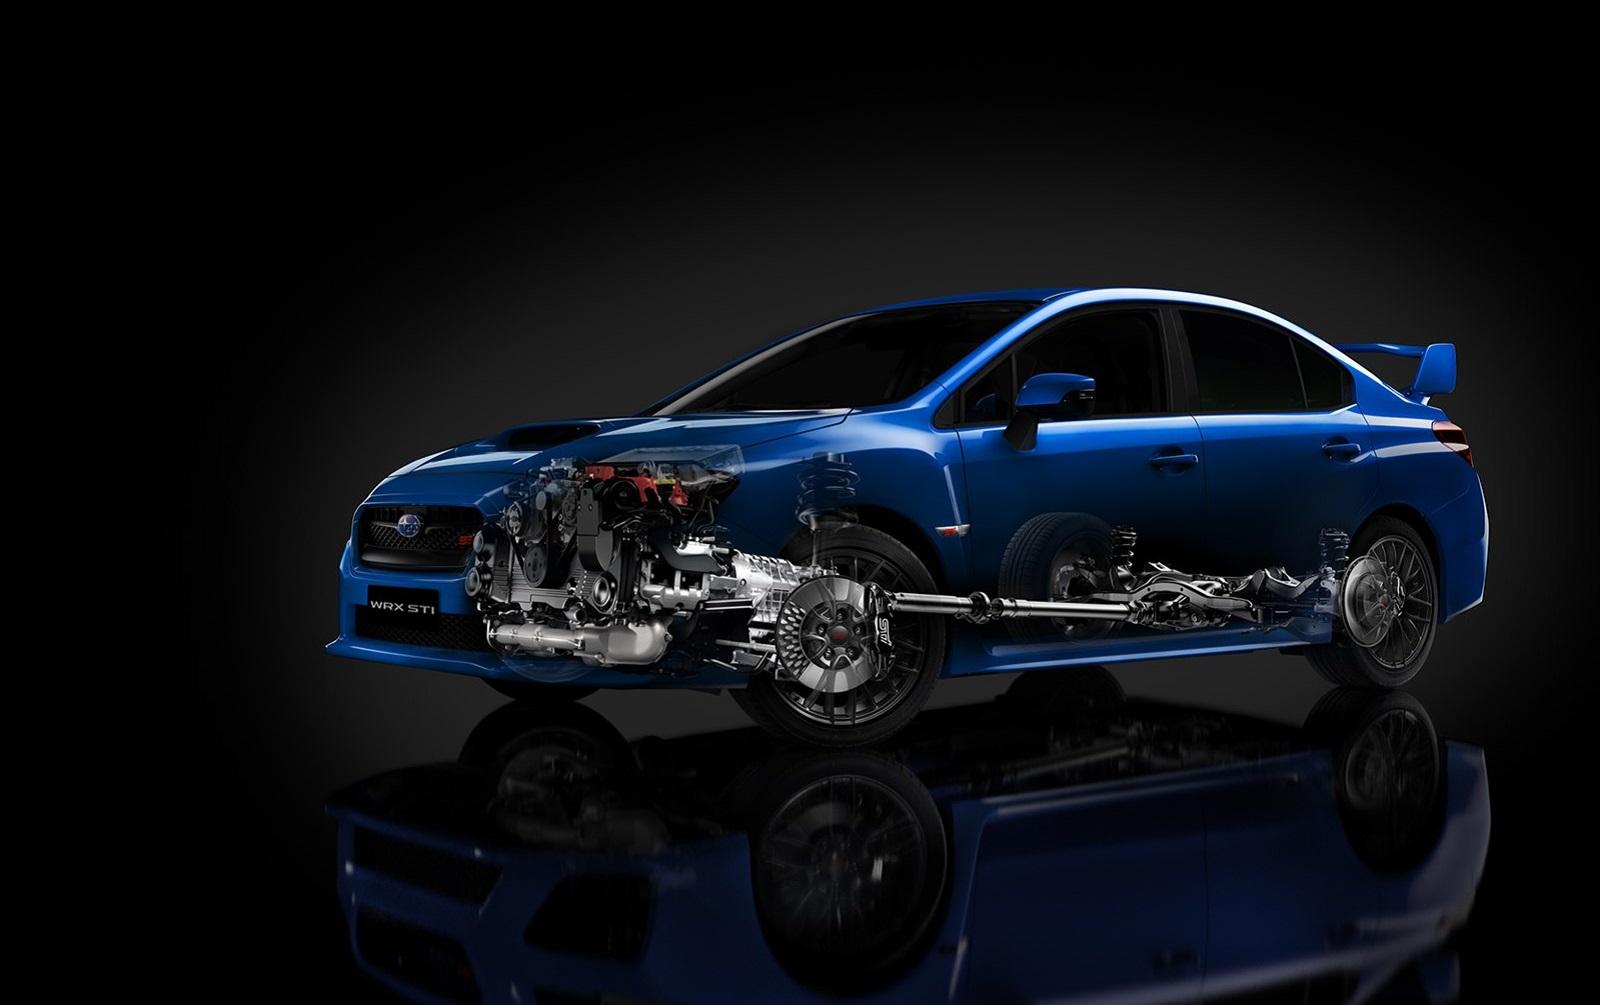 Miraculous Subaru Awd System Fully Explained Youwheel Your Car Expert Wiring Cloud Hemtshollocom